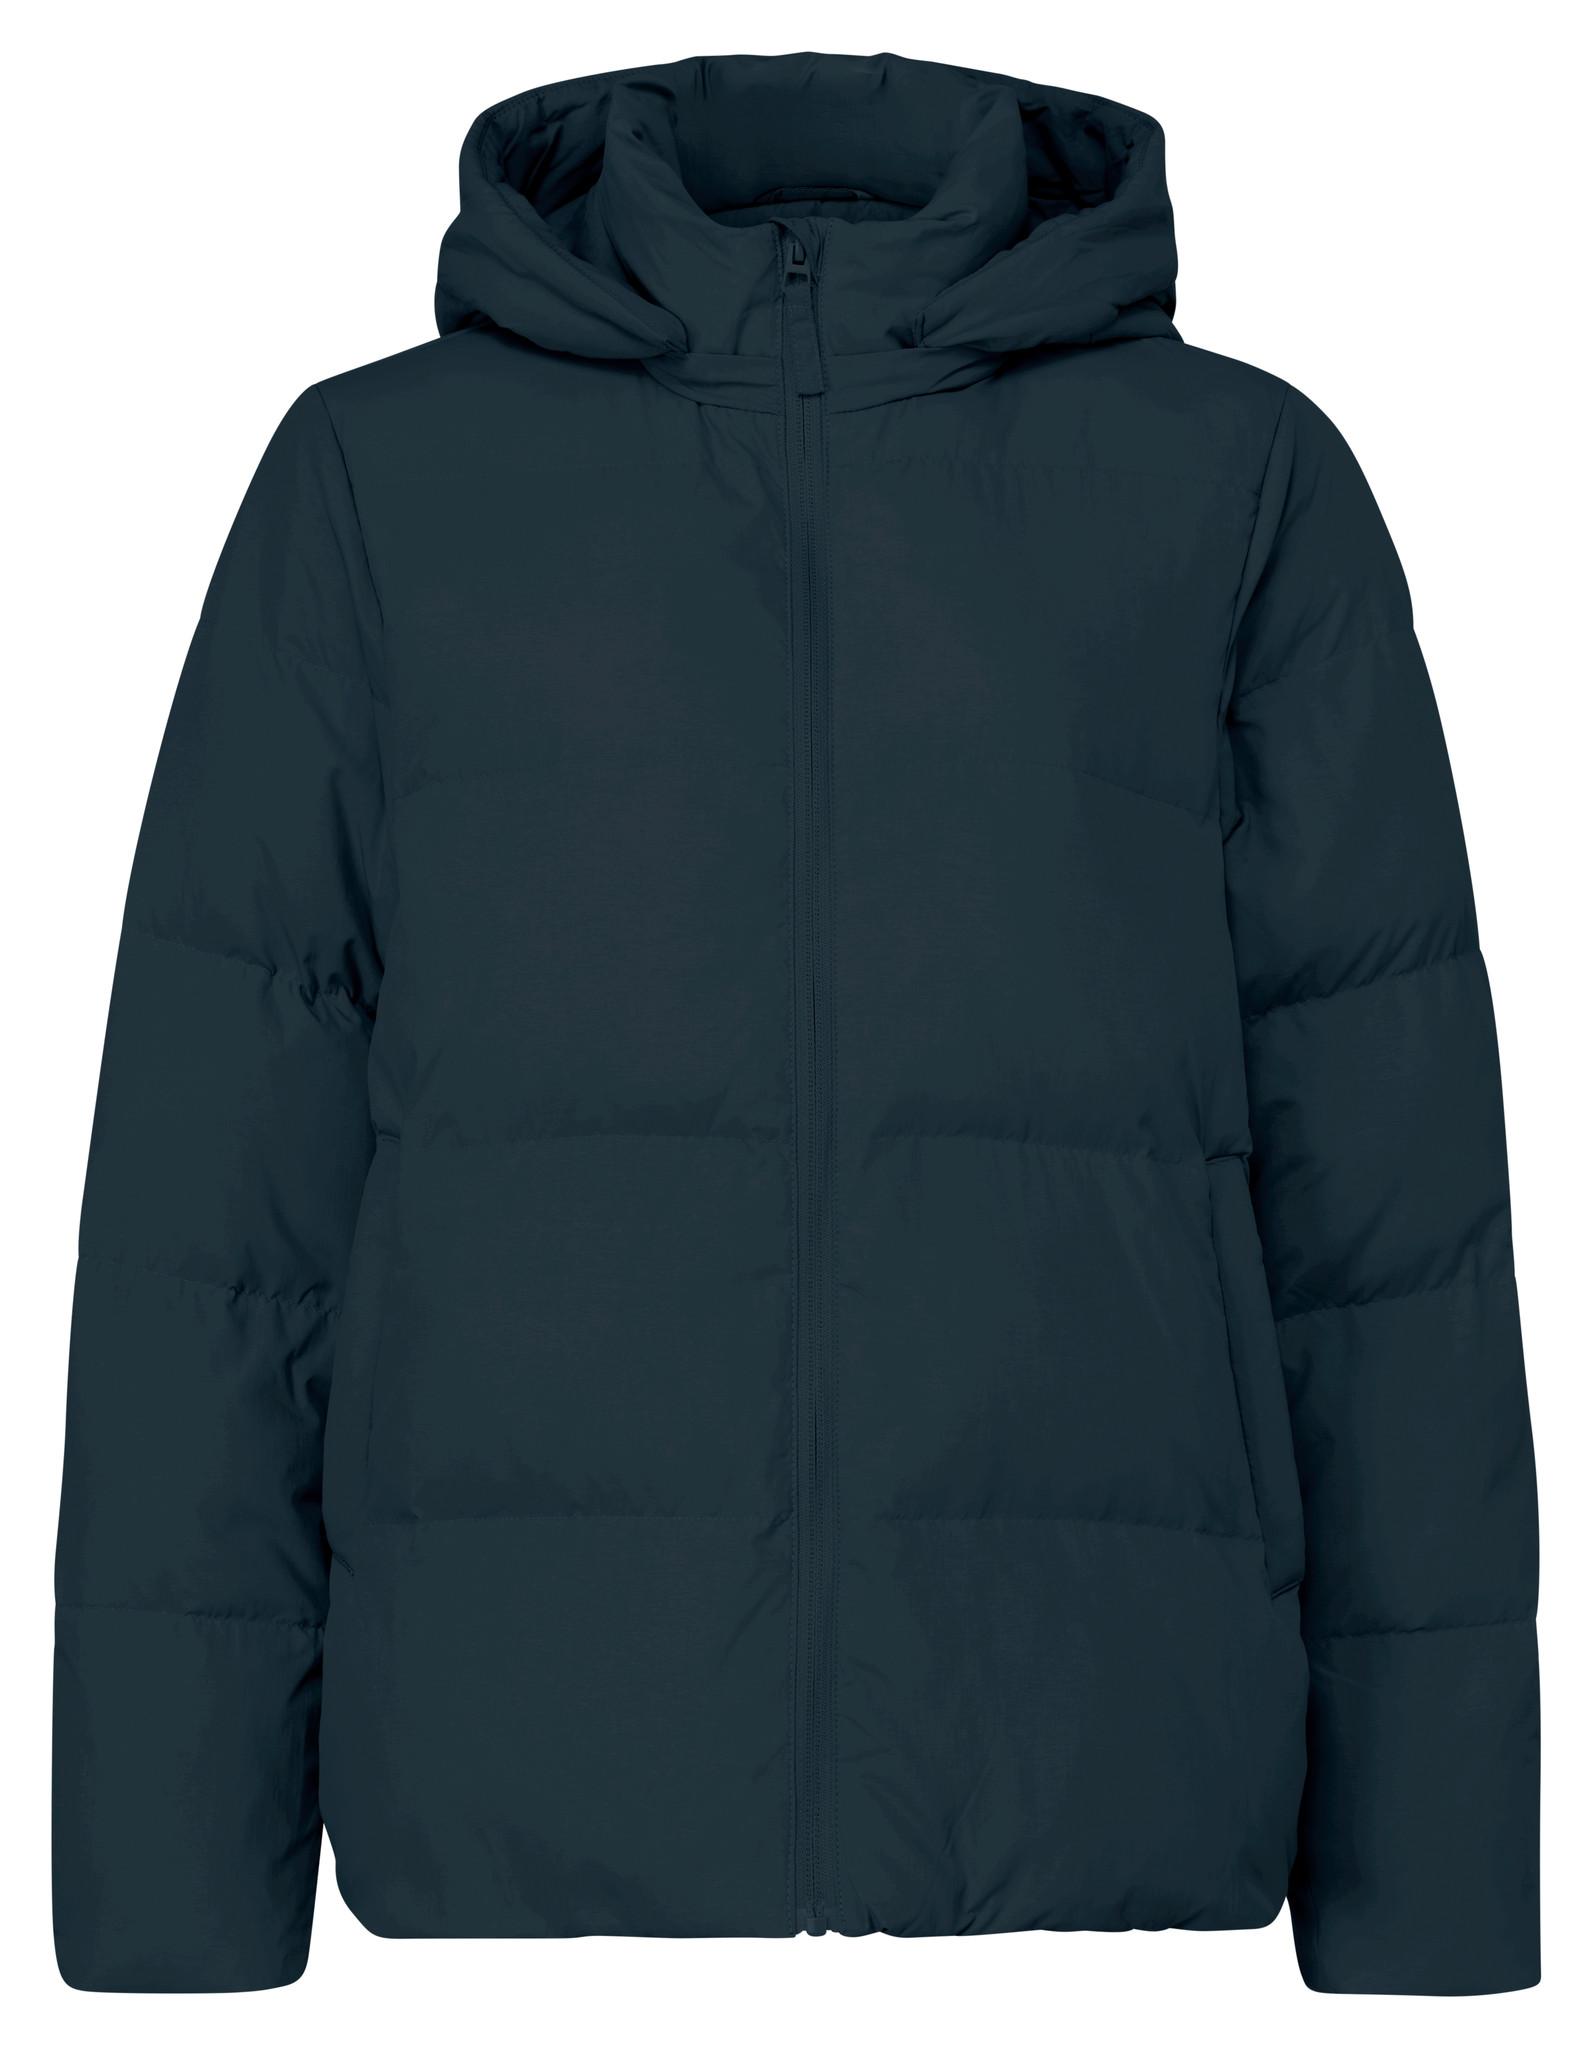 yaya Short puffer jacket 1621029-123-1